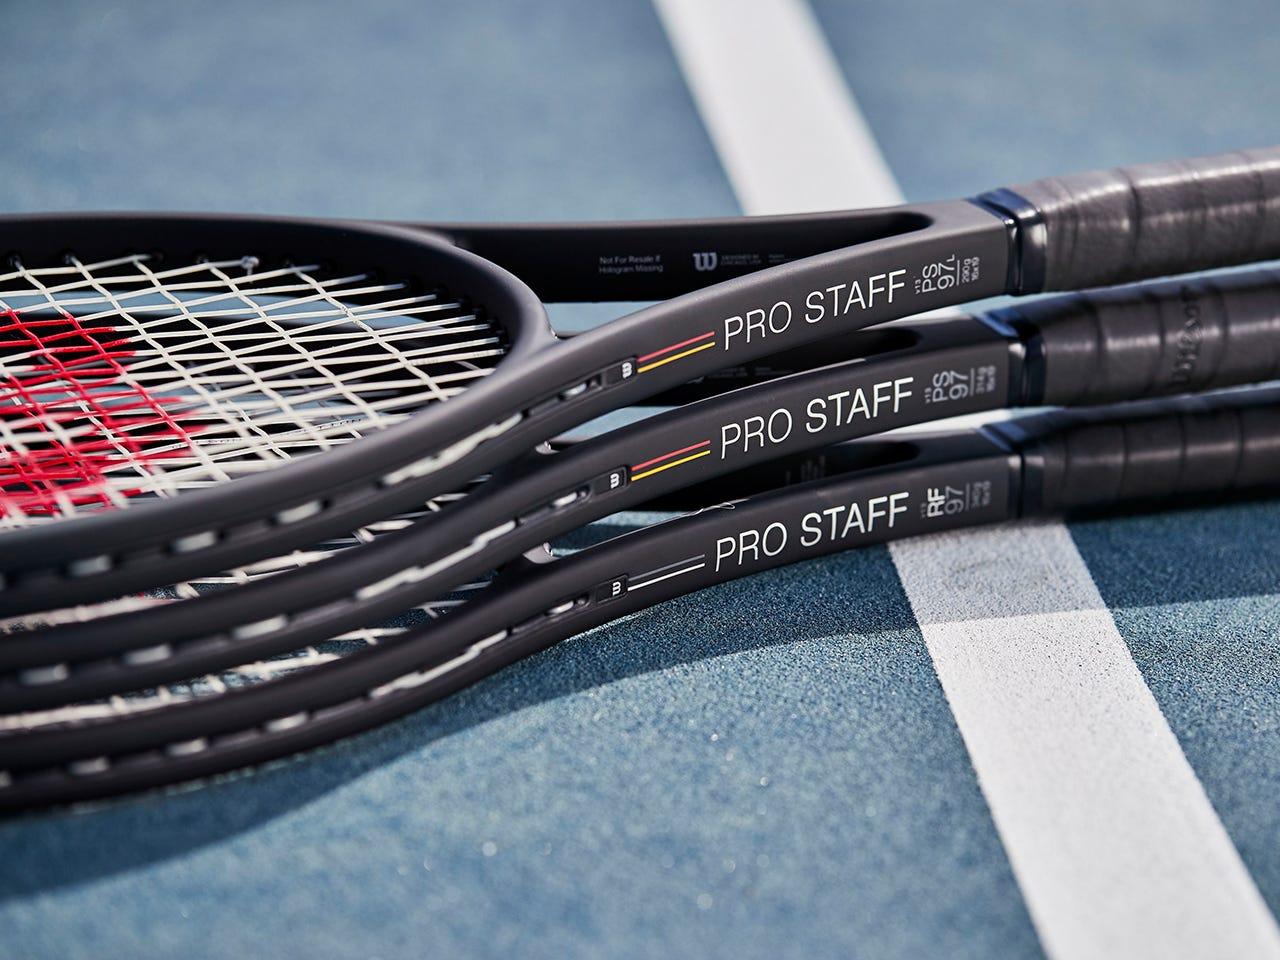 Pro Staff V13 on a tennis court